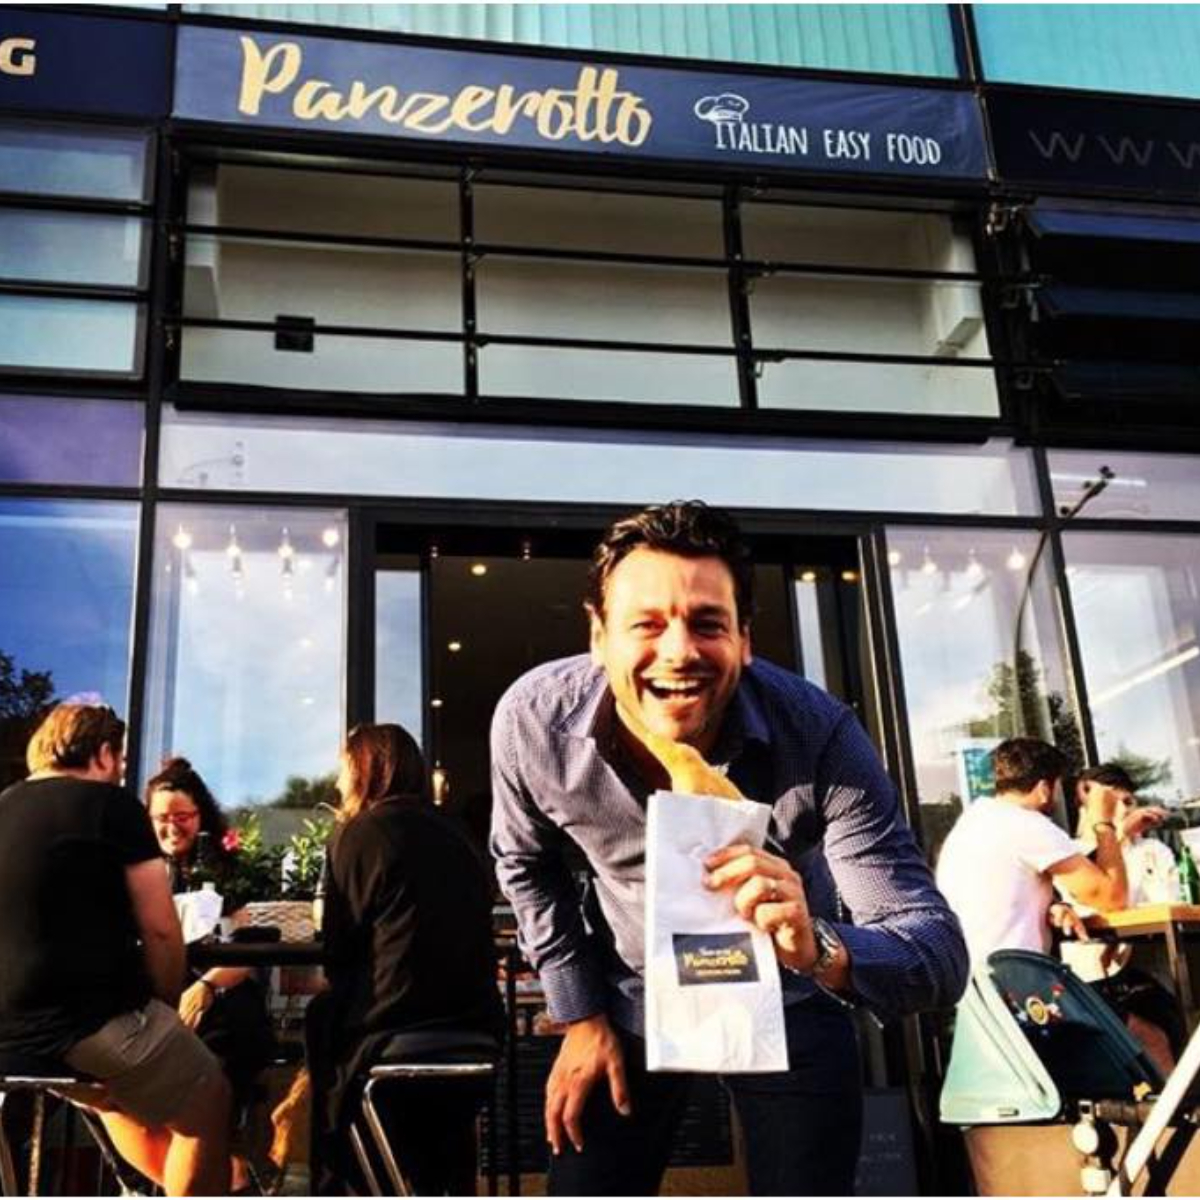 Panzerotto Italian Easy Food Berlin (8)